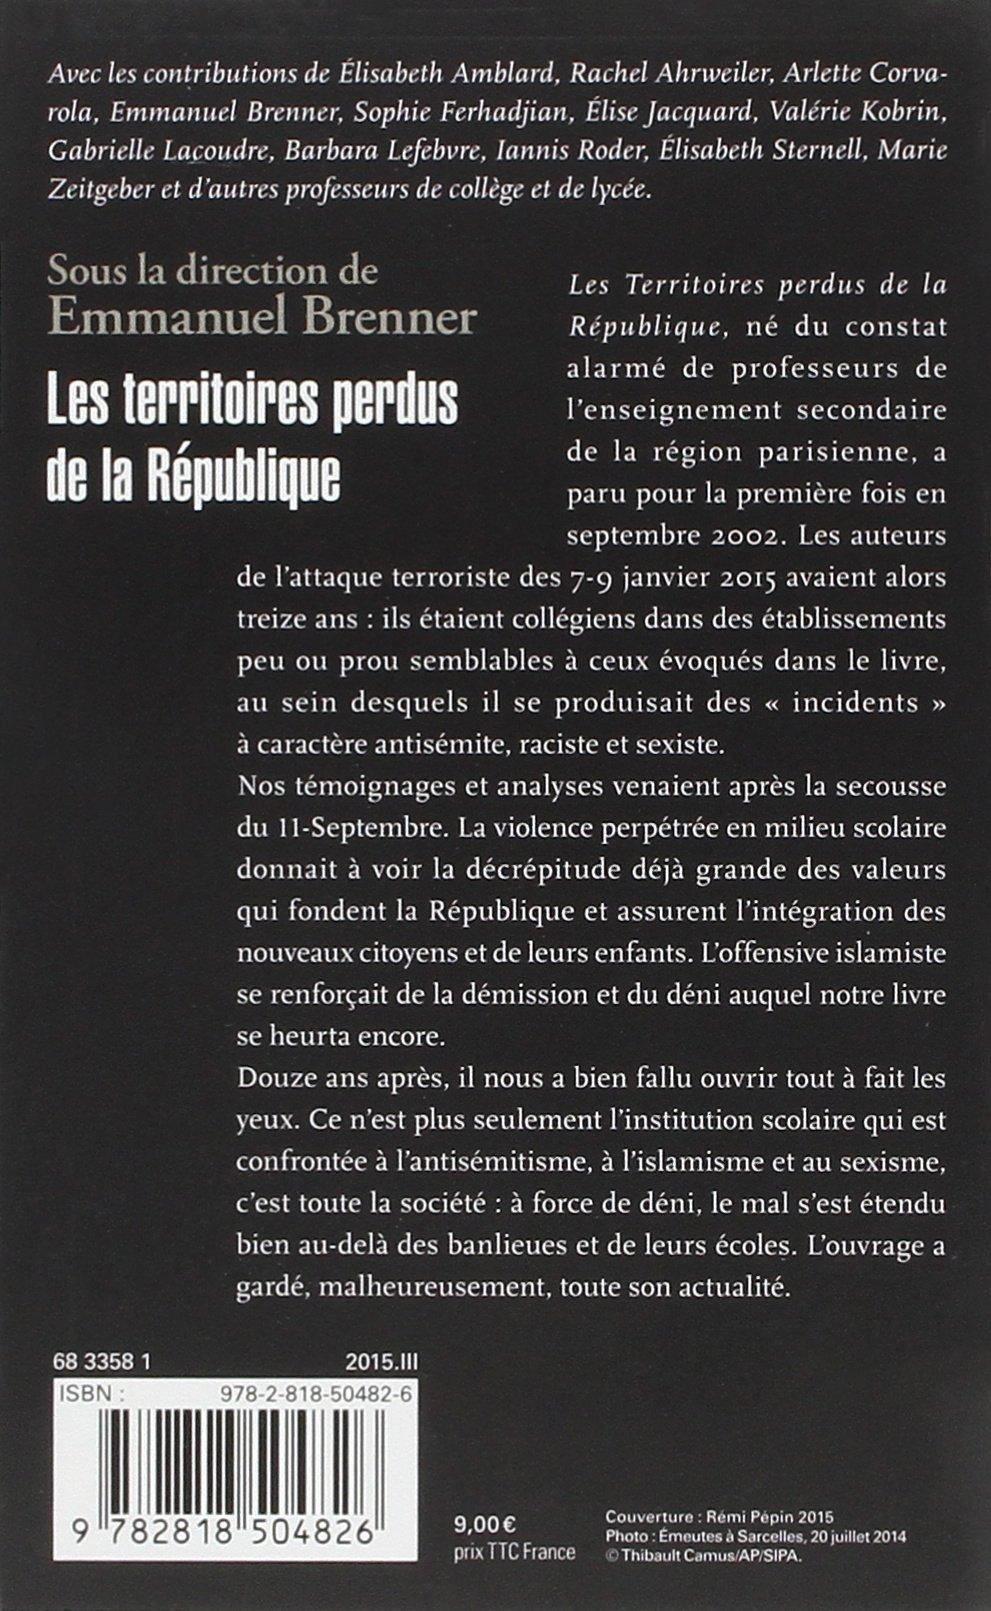 Resultado de imagen de Les Territoires perdus de la République